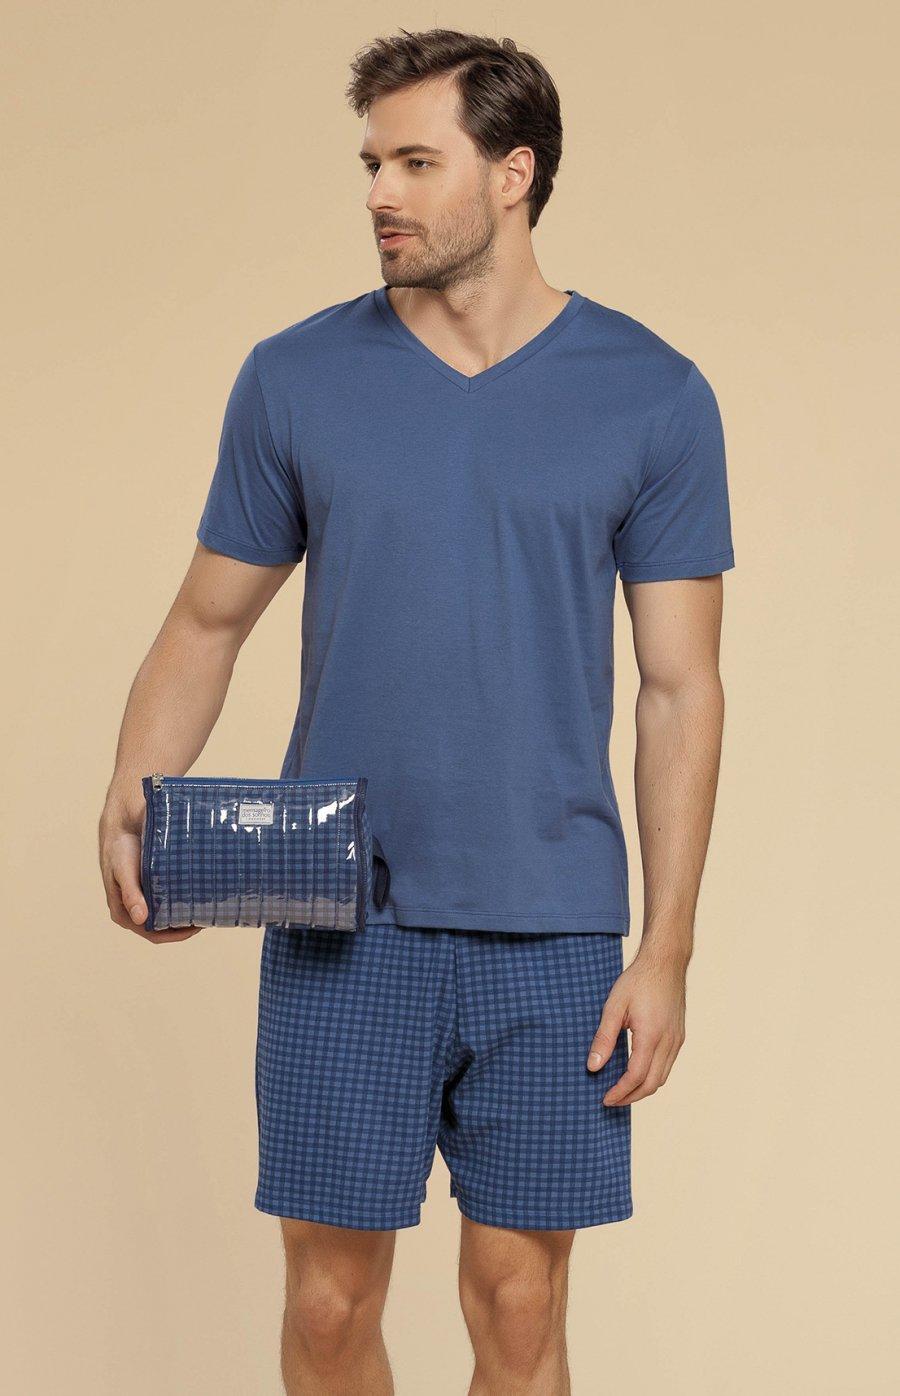 60b5cf98d Encontre Conjunto de pijama masculino em malha | Multiplace